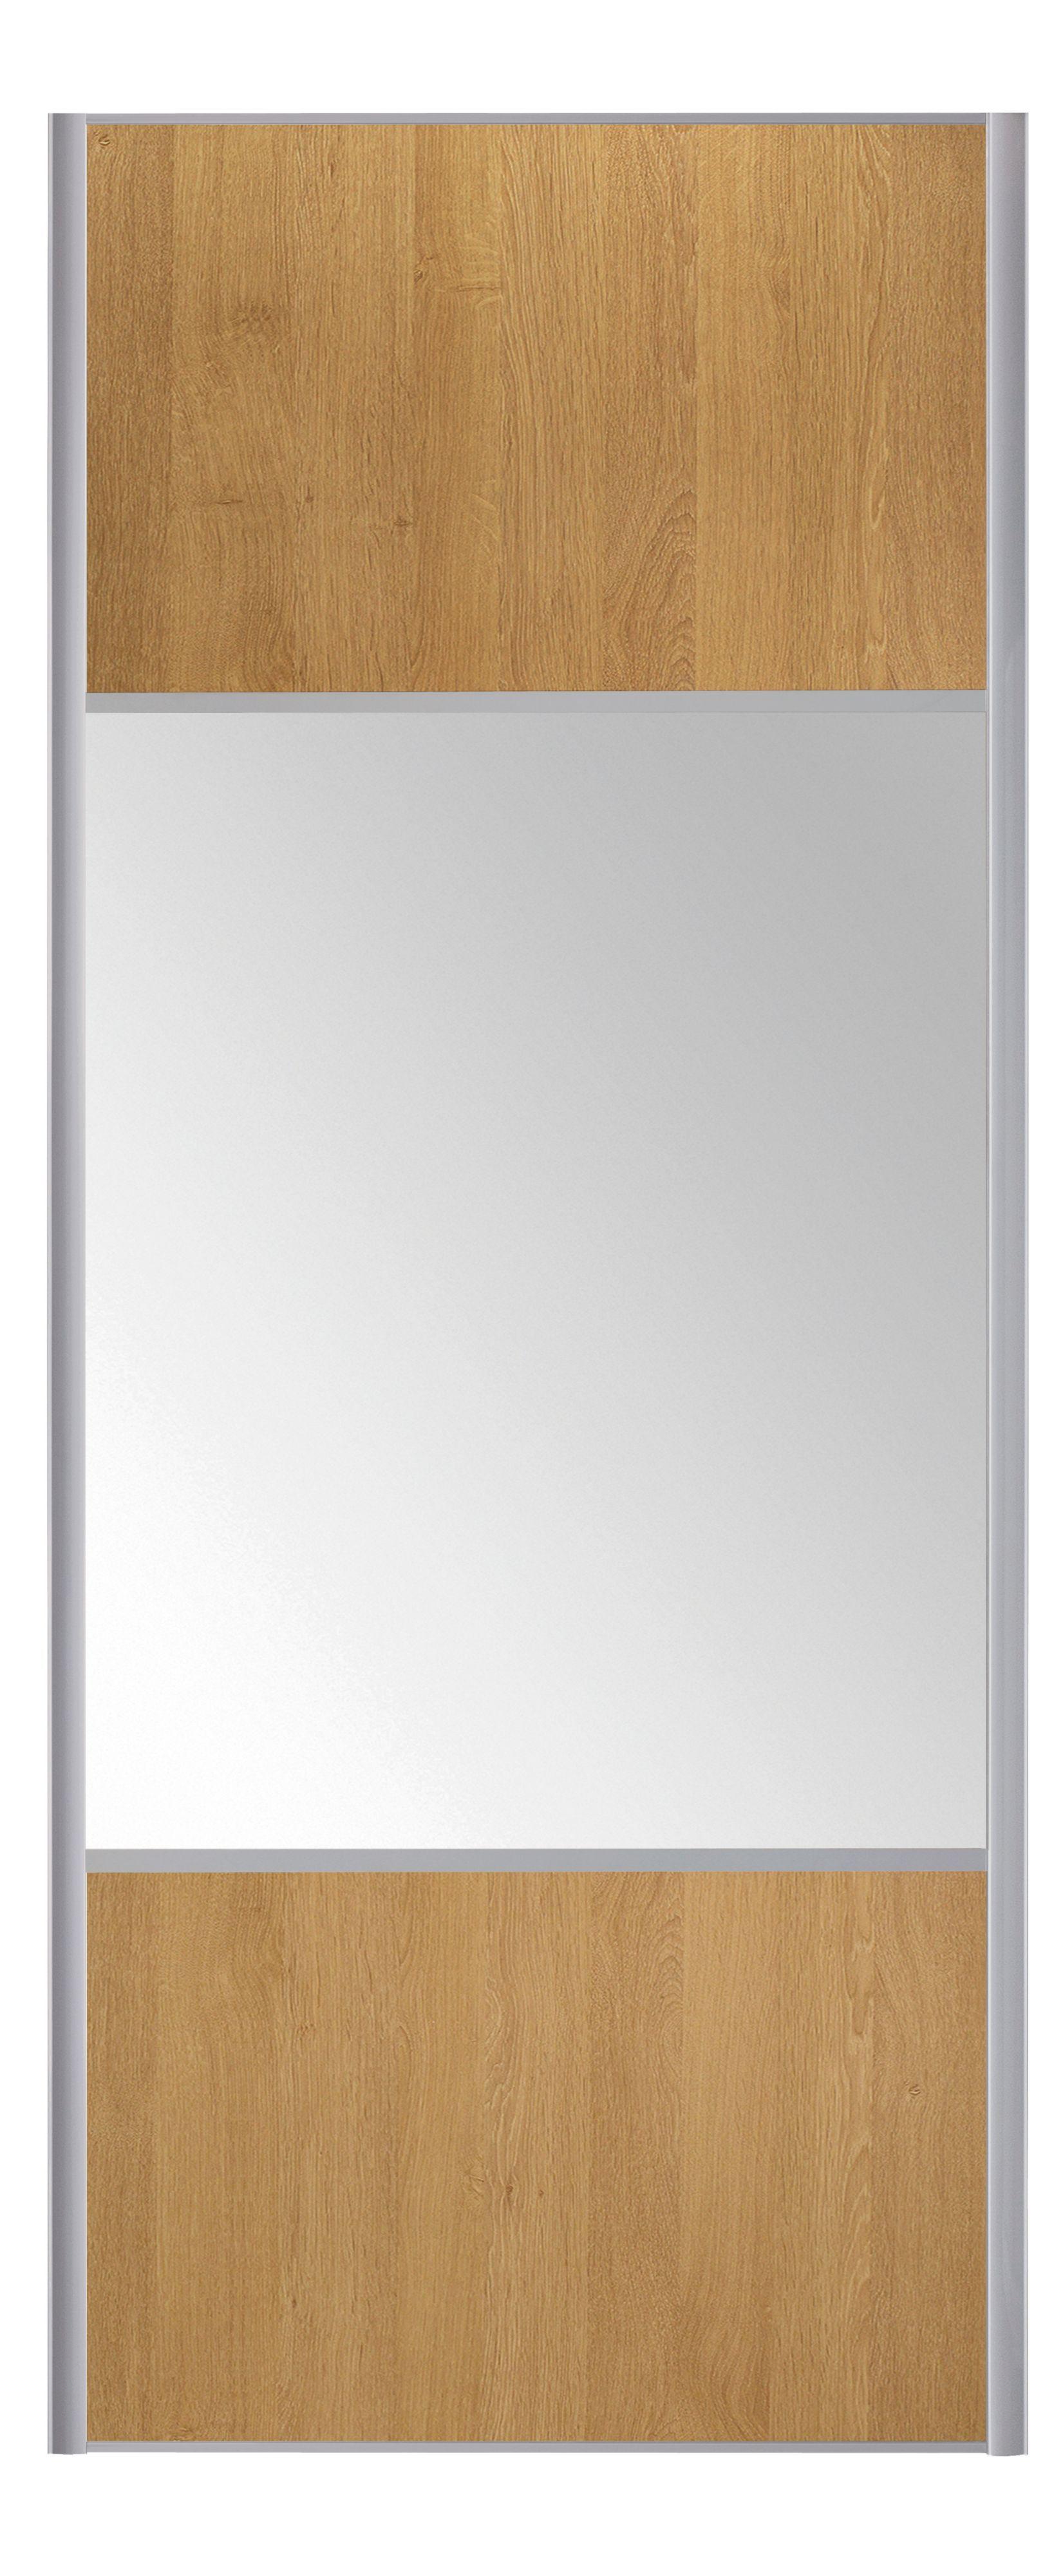 3 Panel Mirror Mix Match Sliding Wardrobe Door H 2200 Mm W 922 Mm D